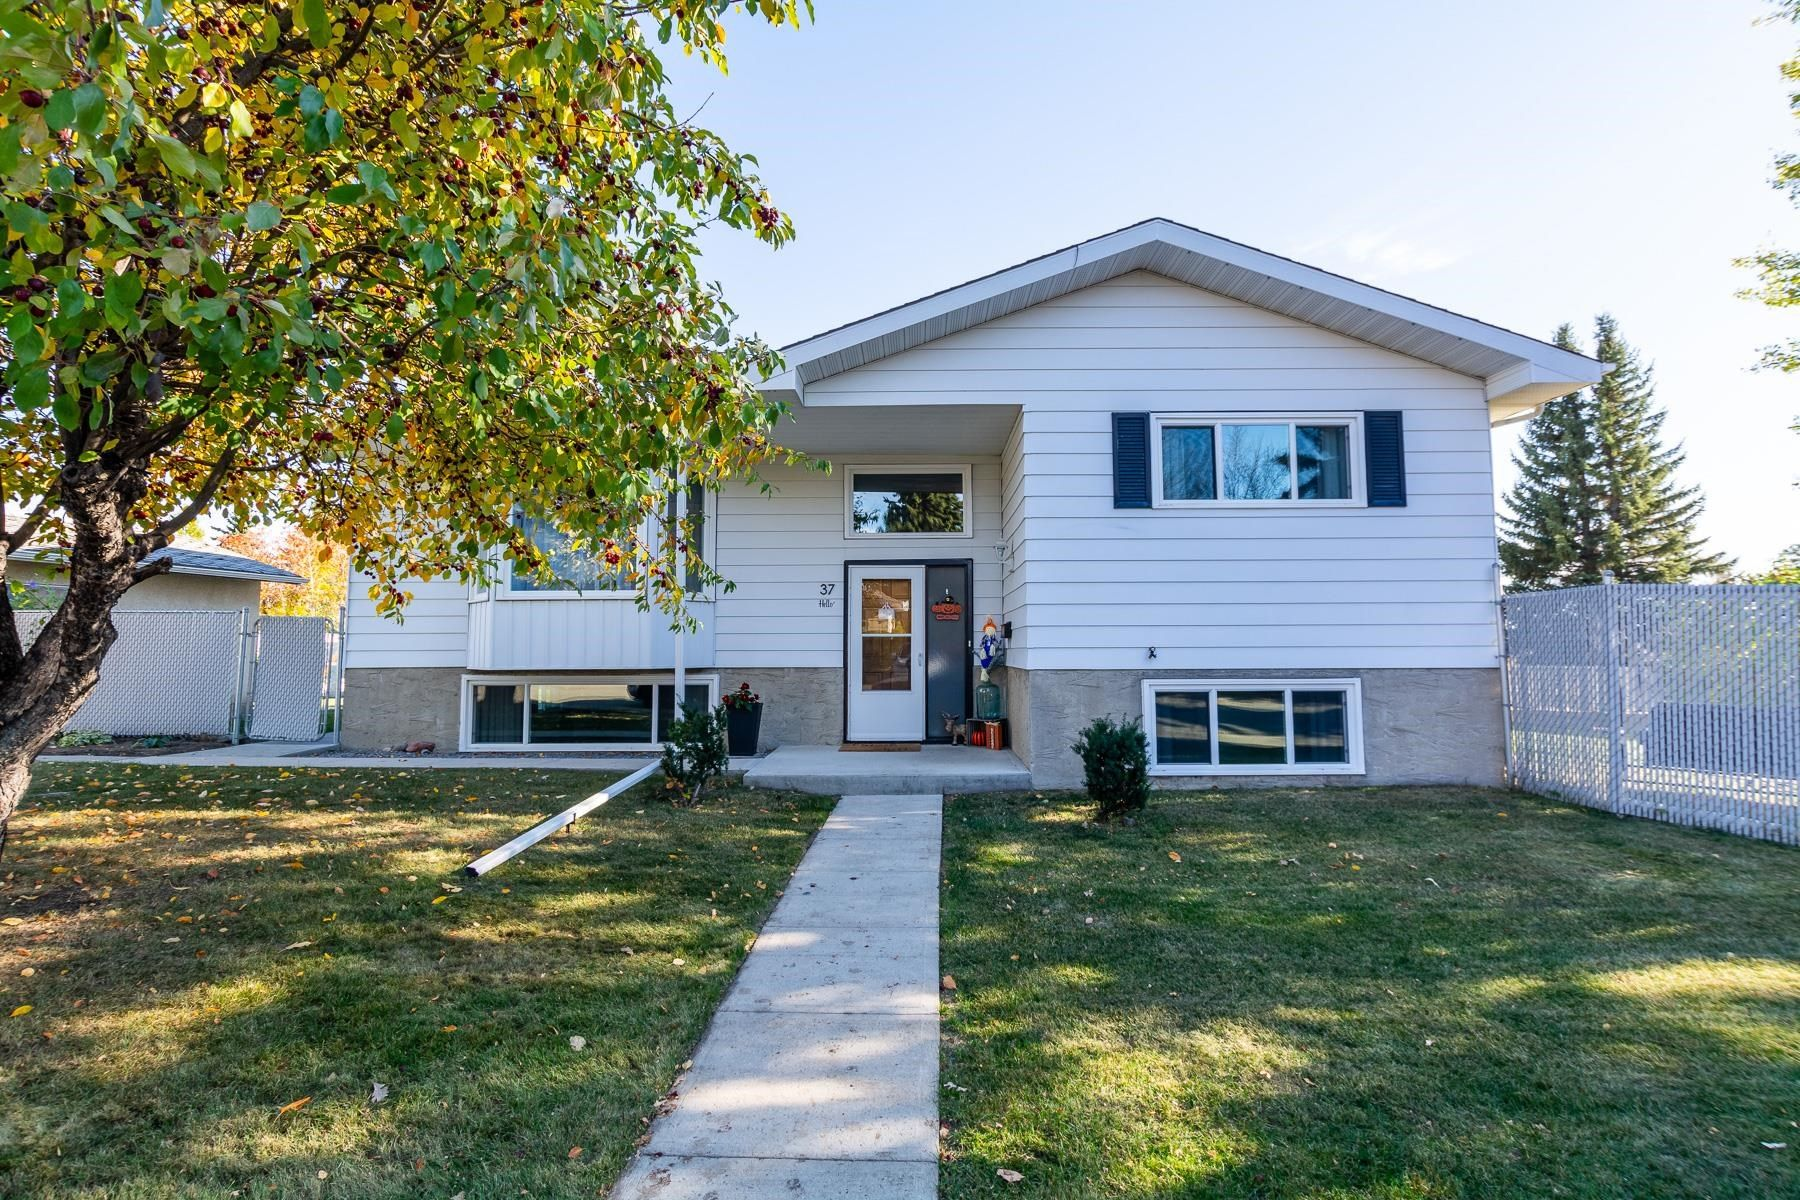 Main Photo: 37 Granville Crescent: Sherwood Park House for sale : MLS®# E4266241